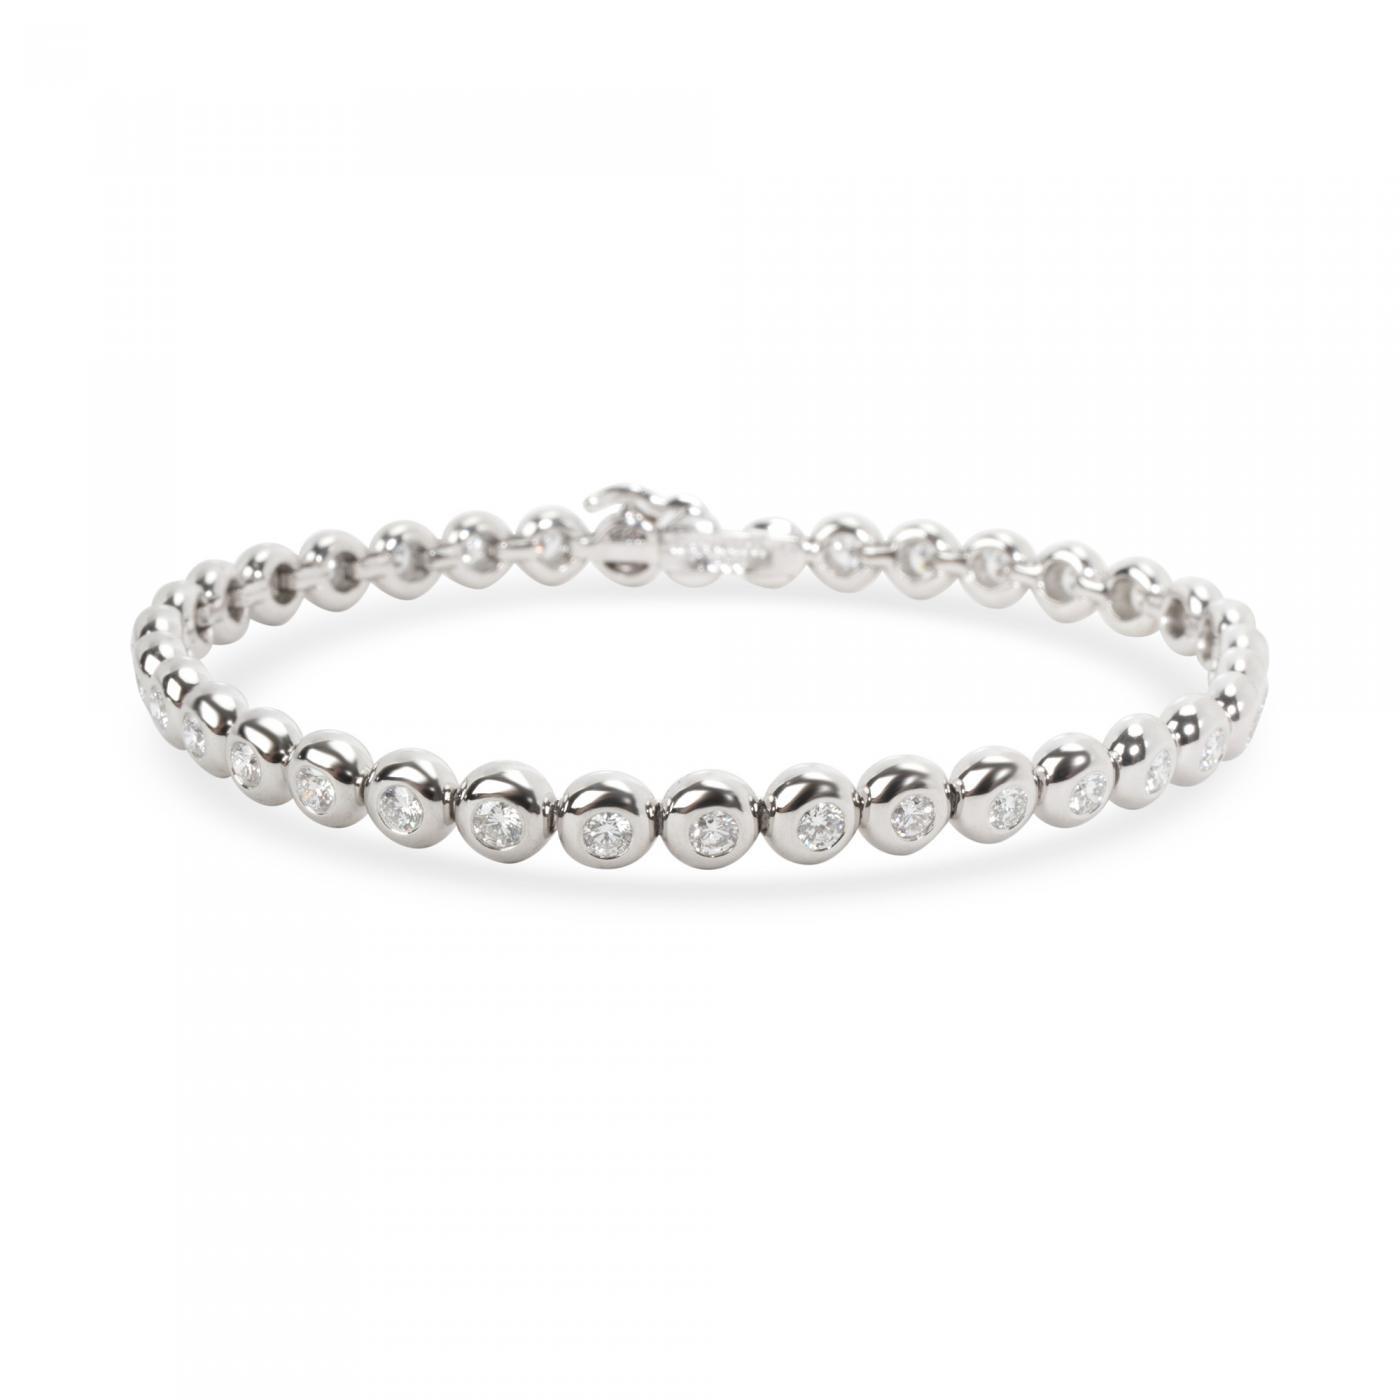 Tiffany Co Tiffany Co Doughnut Bezel Diamond Tennis Bracelet In Platinum 2 50 Ctw